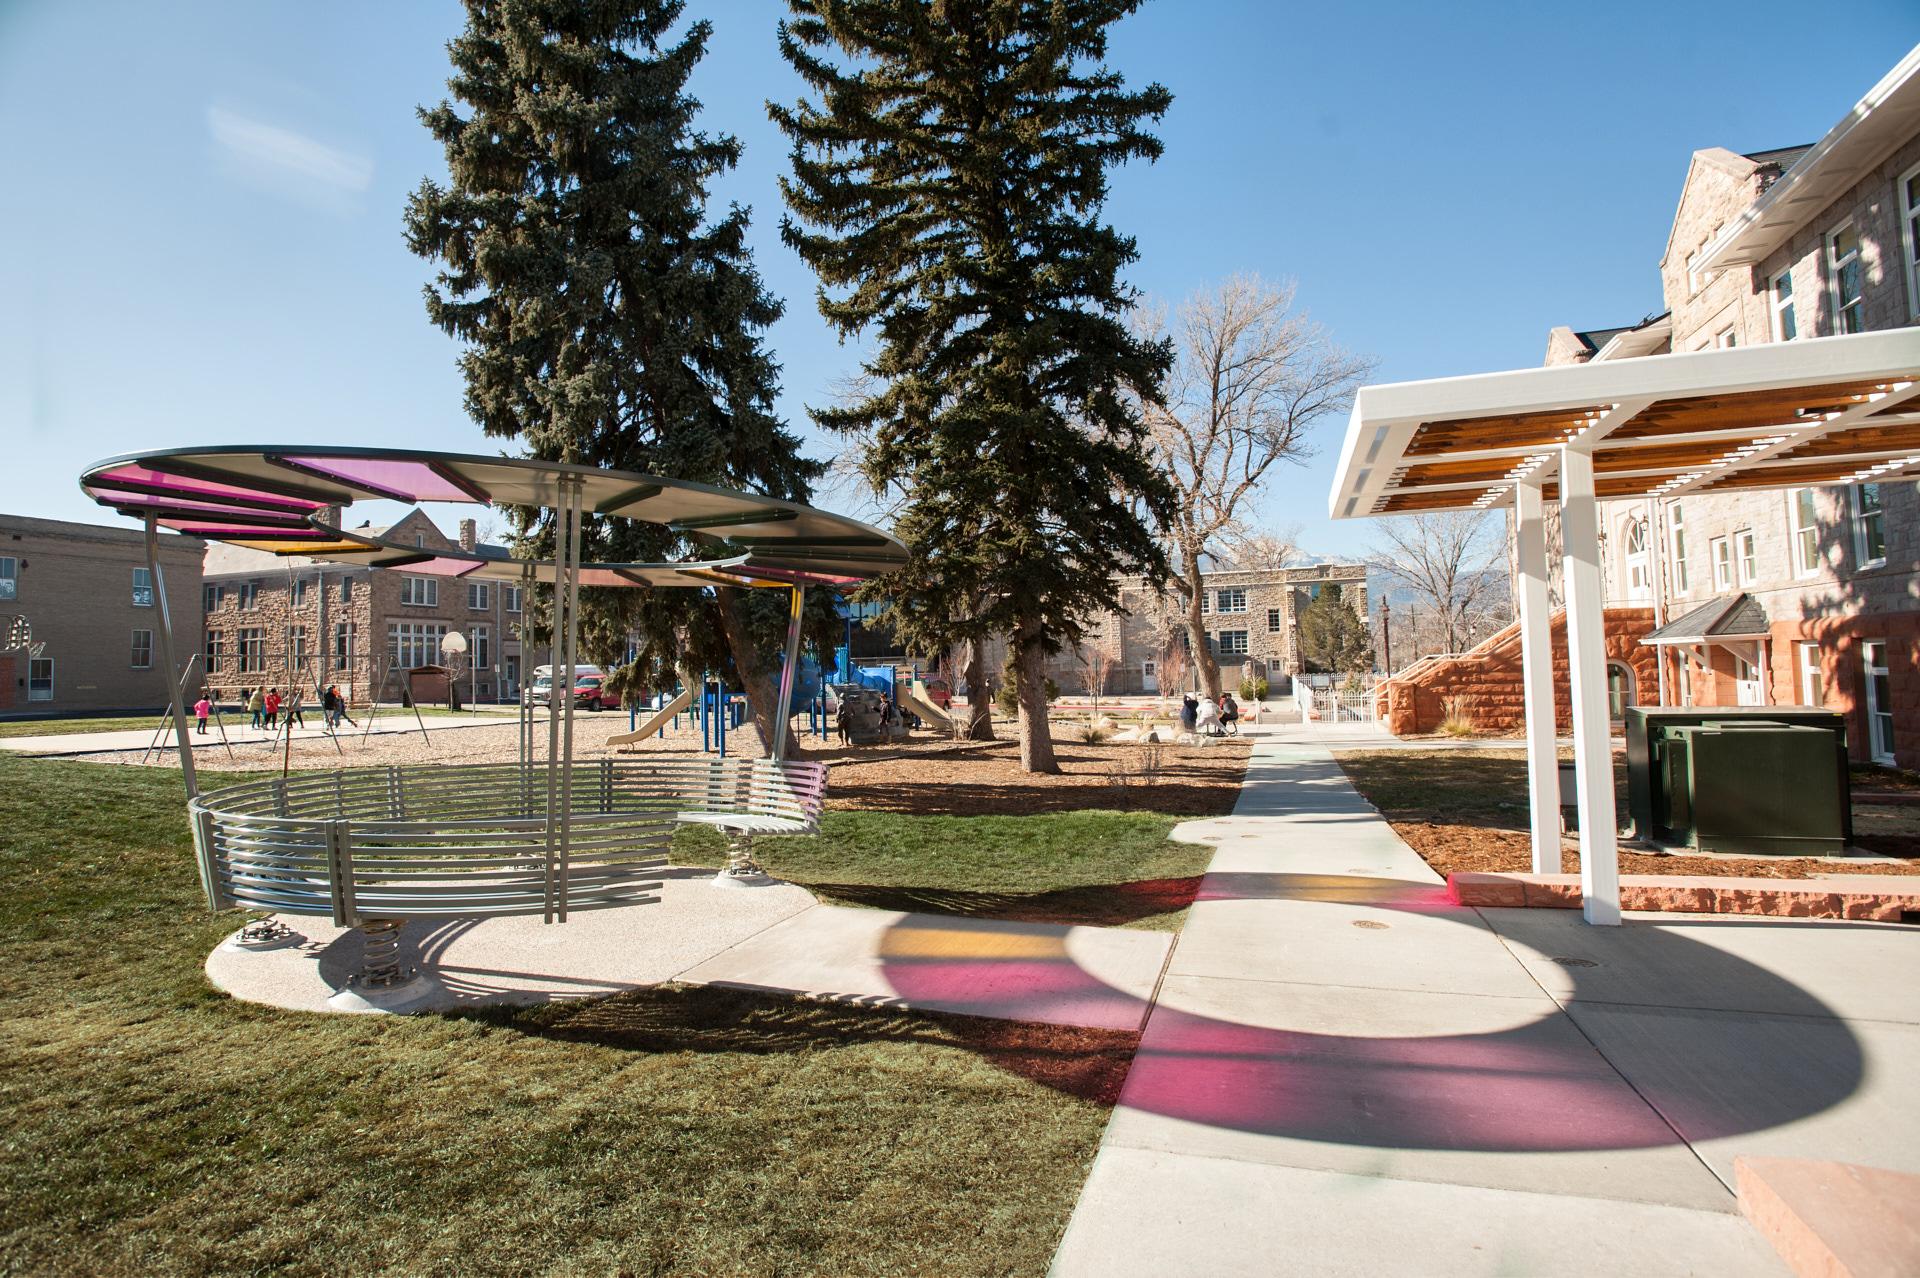 Matthew Geller_Springs_Colorado Springs_Public Art Services_J Grant Projects_30.jpg